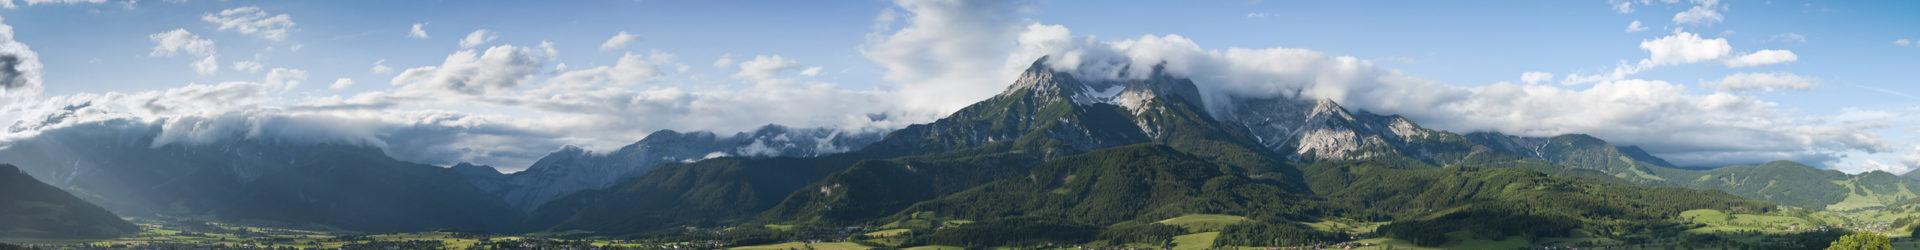 Kaisergebirge Feldberg Stripsenkopf